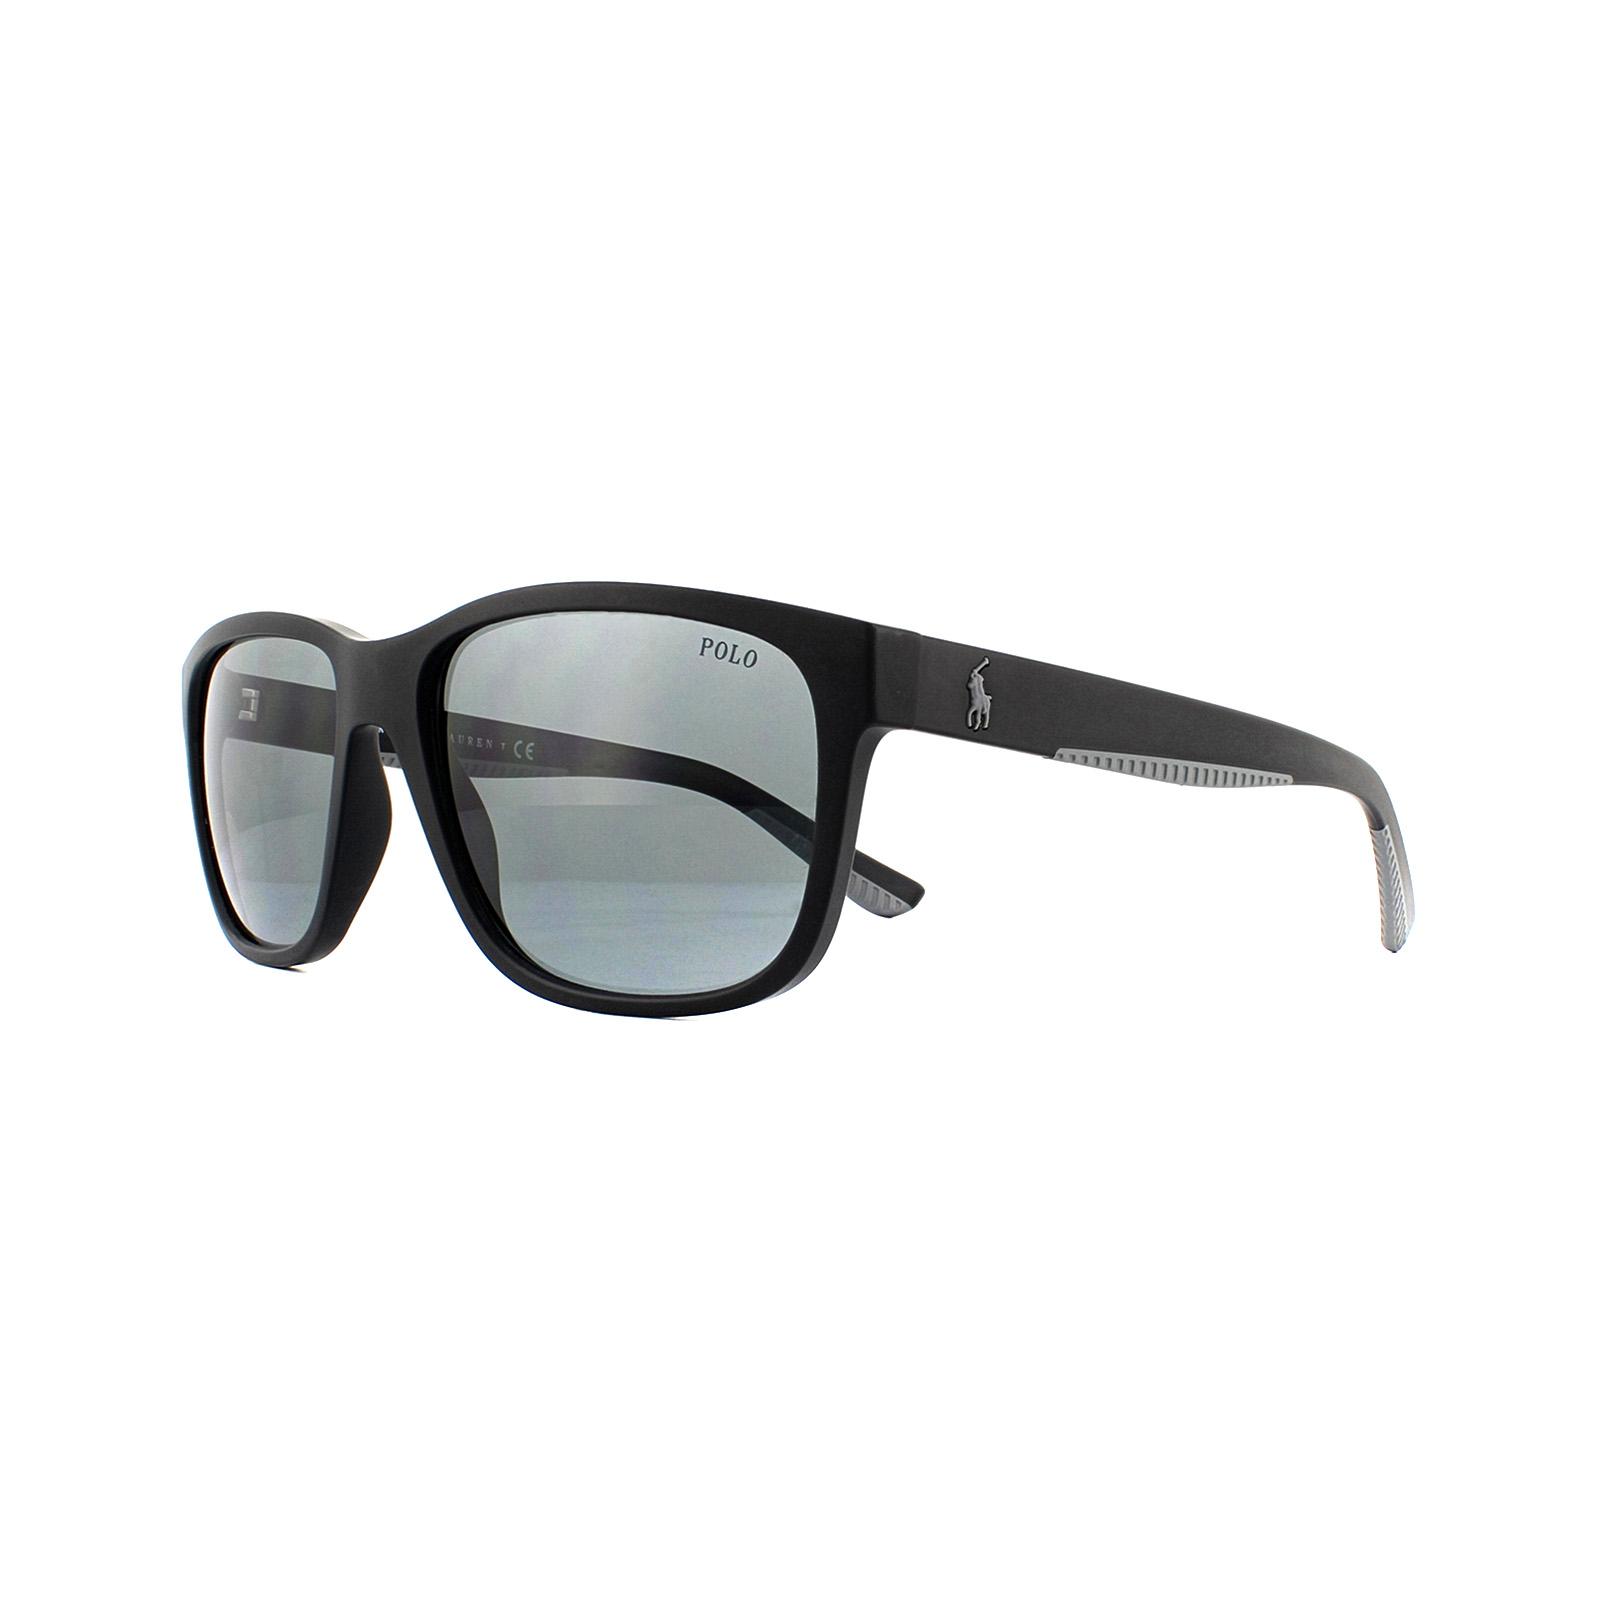 aec0f601f Sentinel Polo Ralph Lauren Sunglasses PH4142 528487 Matte Black Grey